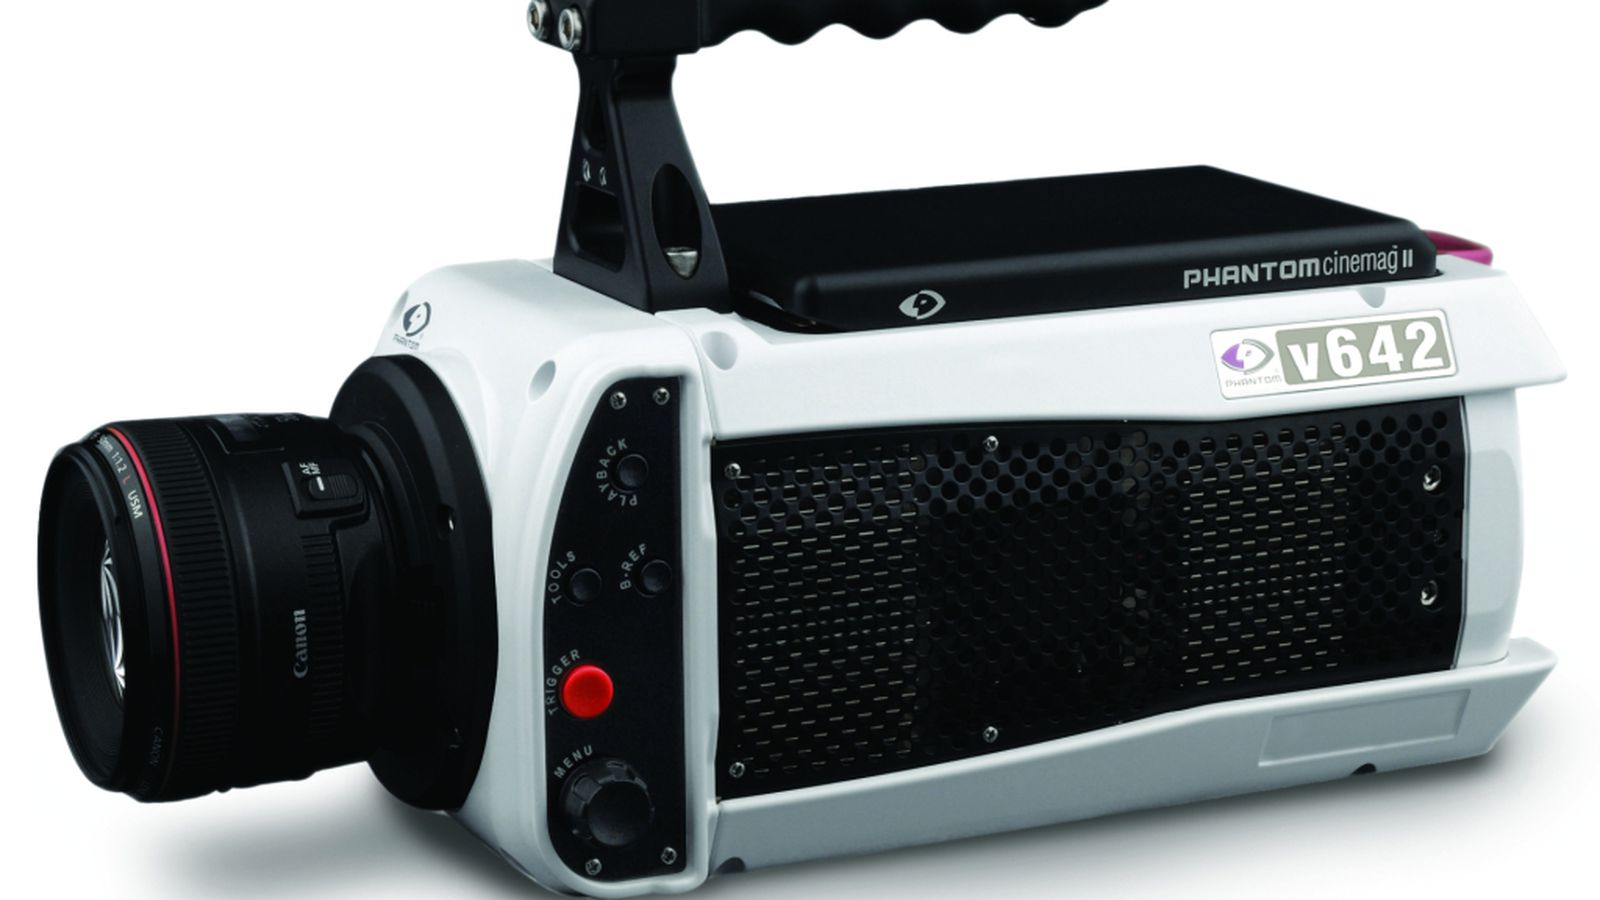 Phantom v642 high speed broadcast camera shoots at 5 for Web tv camera